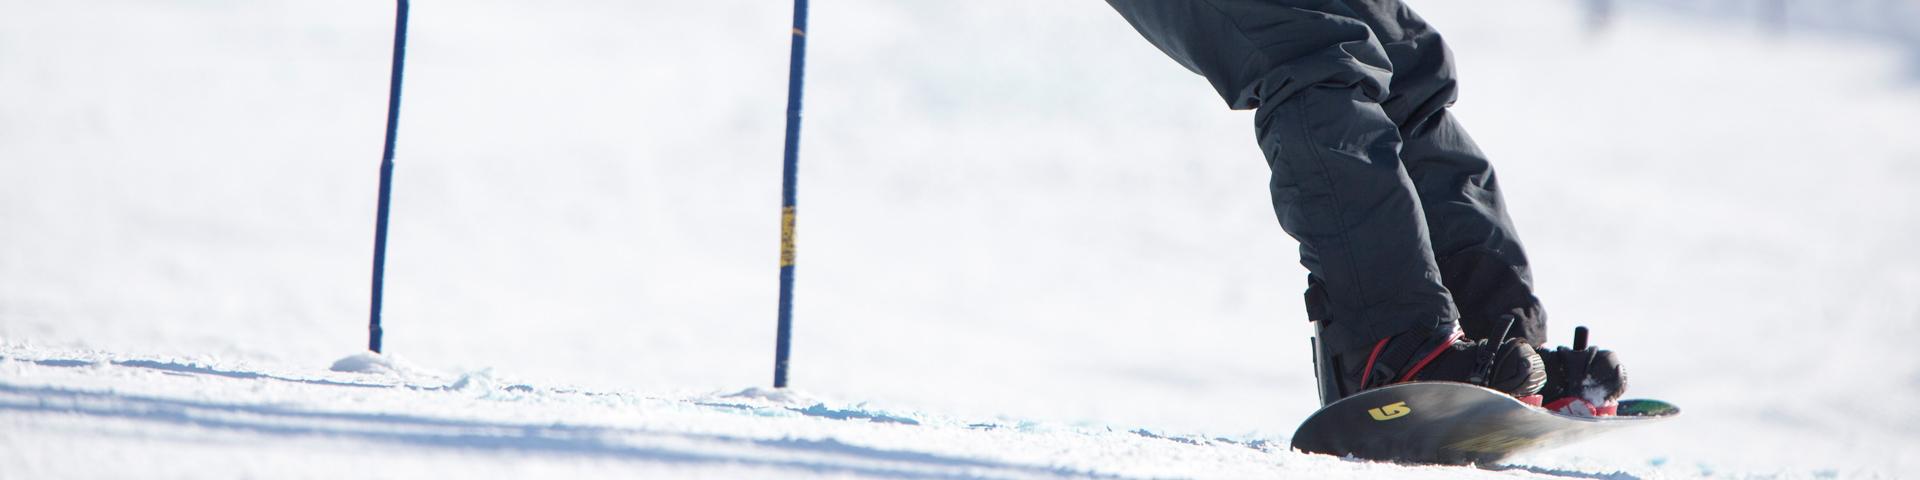 special olympics snowboarding